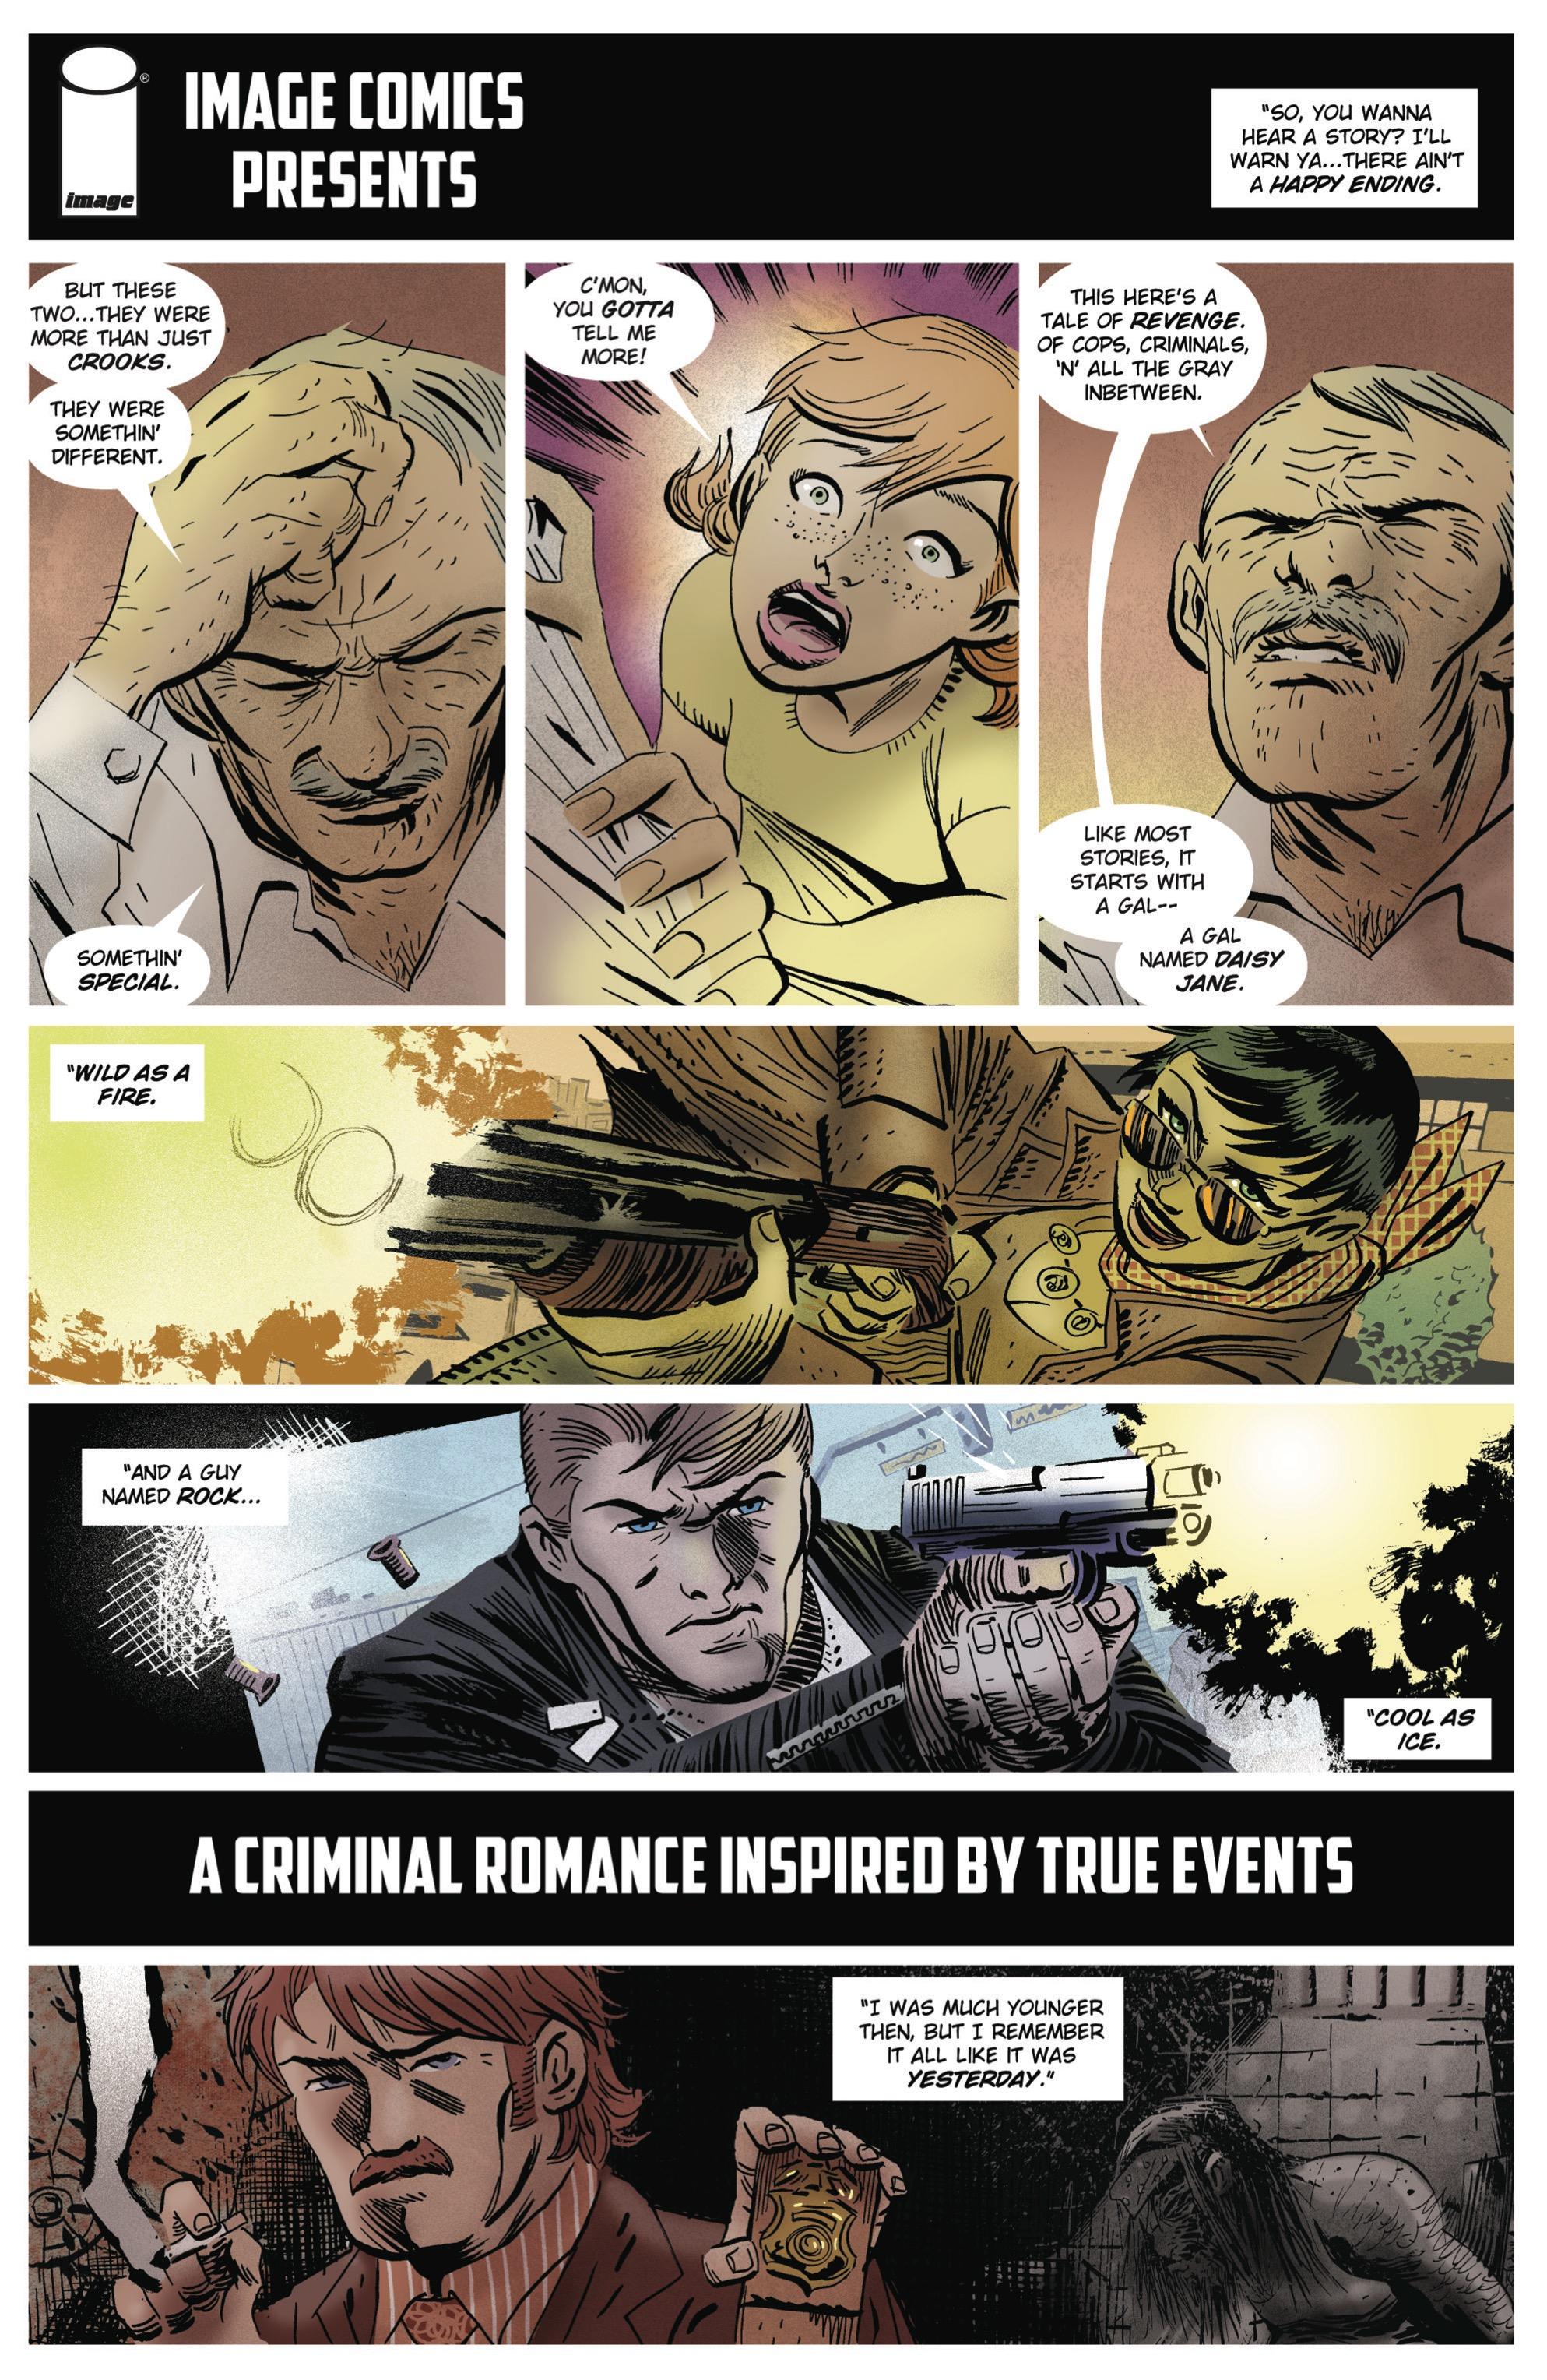 Read online Demonic comic -  Issue #3 - 26